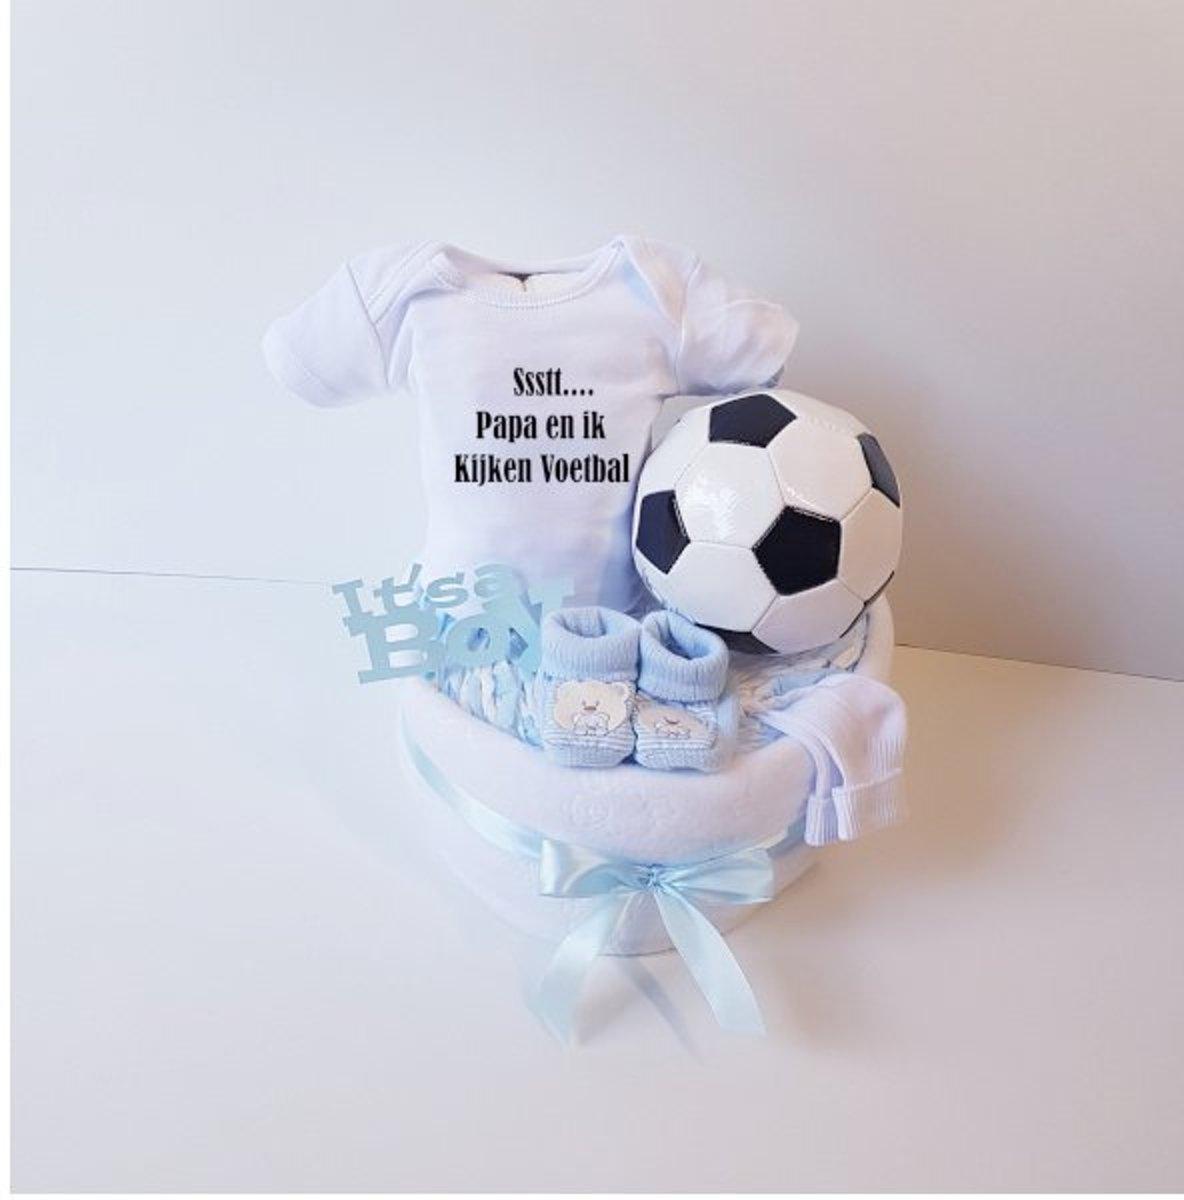 Voetbal Luiertaart Ssst Papa En Ik Kijken Voetbal | Kraamcadeau | Kraampakket | Baby Cadeau